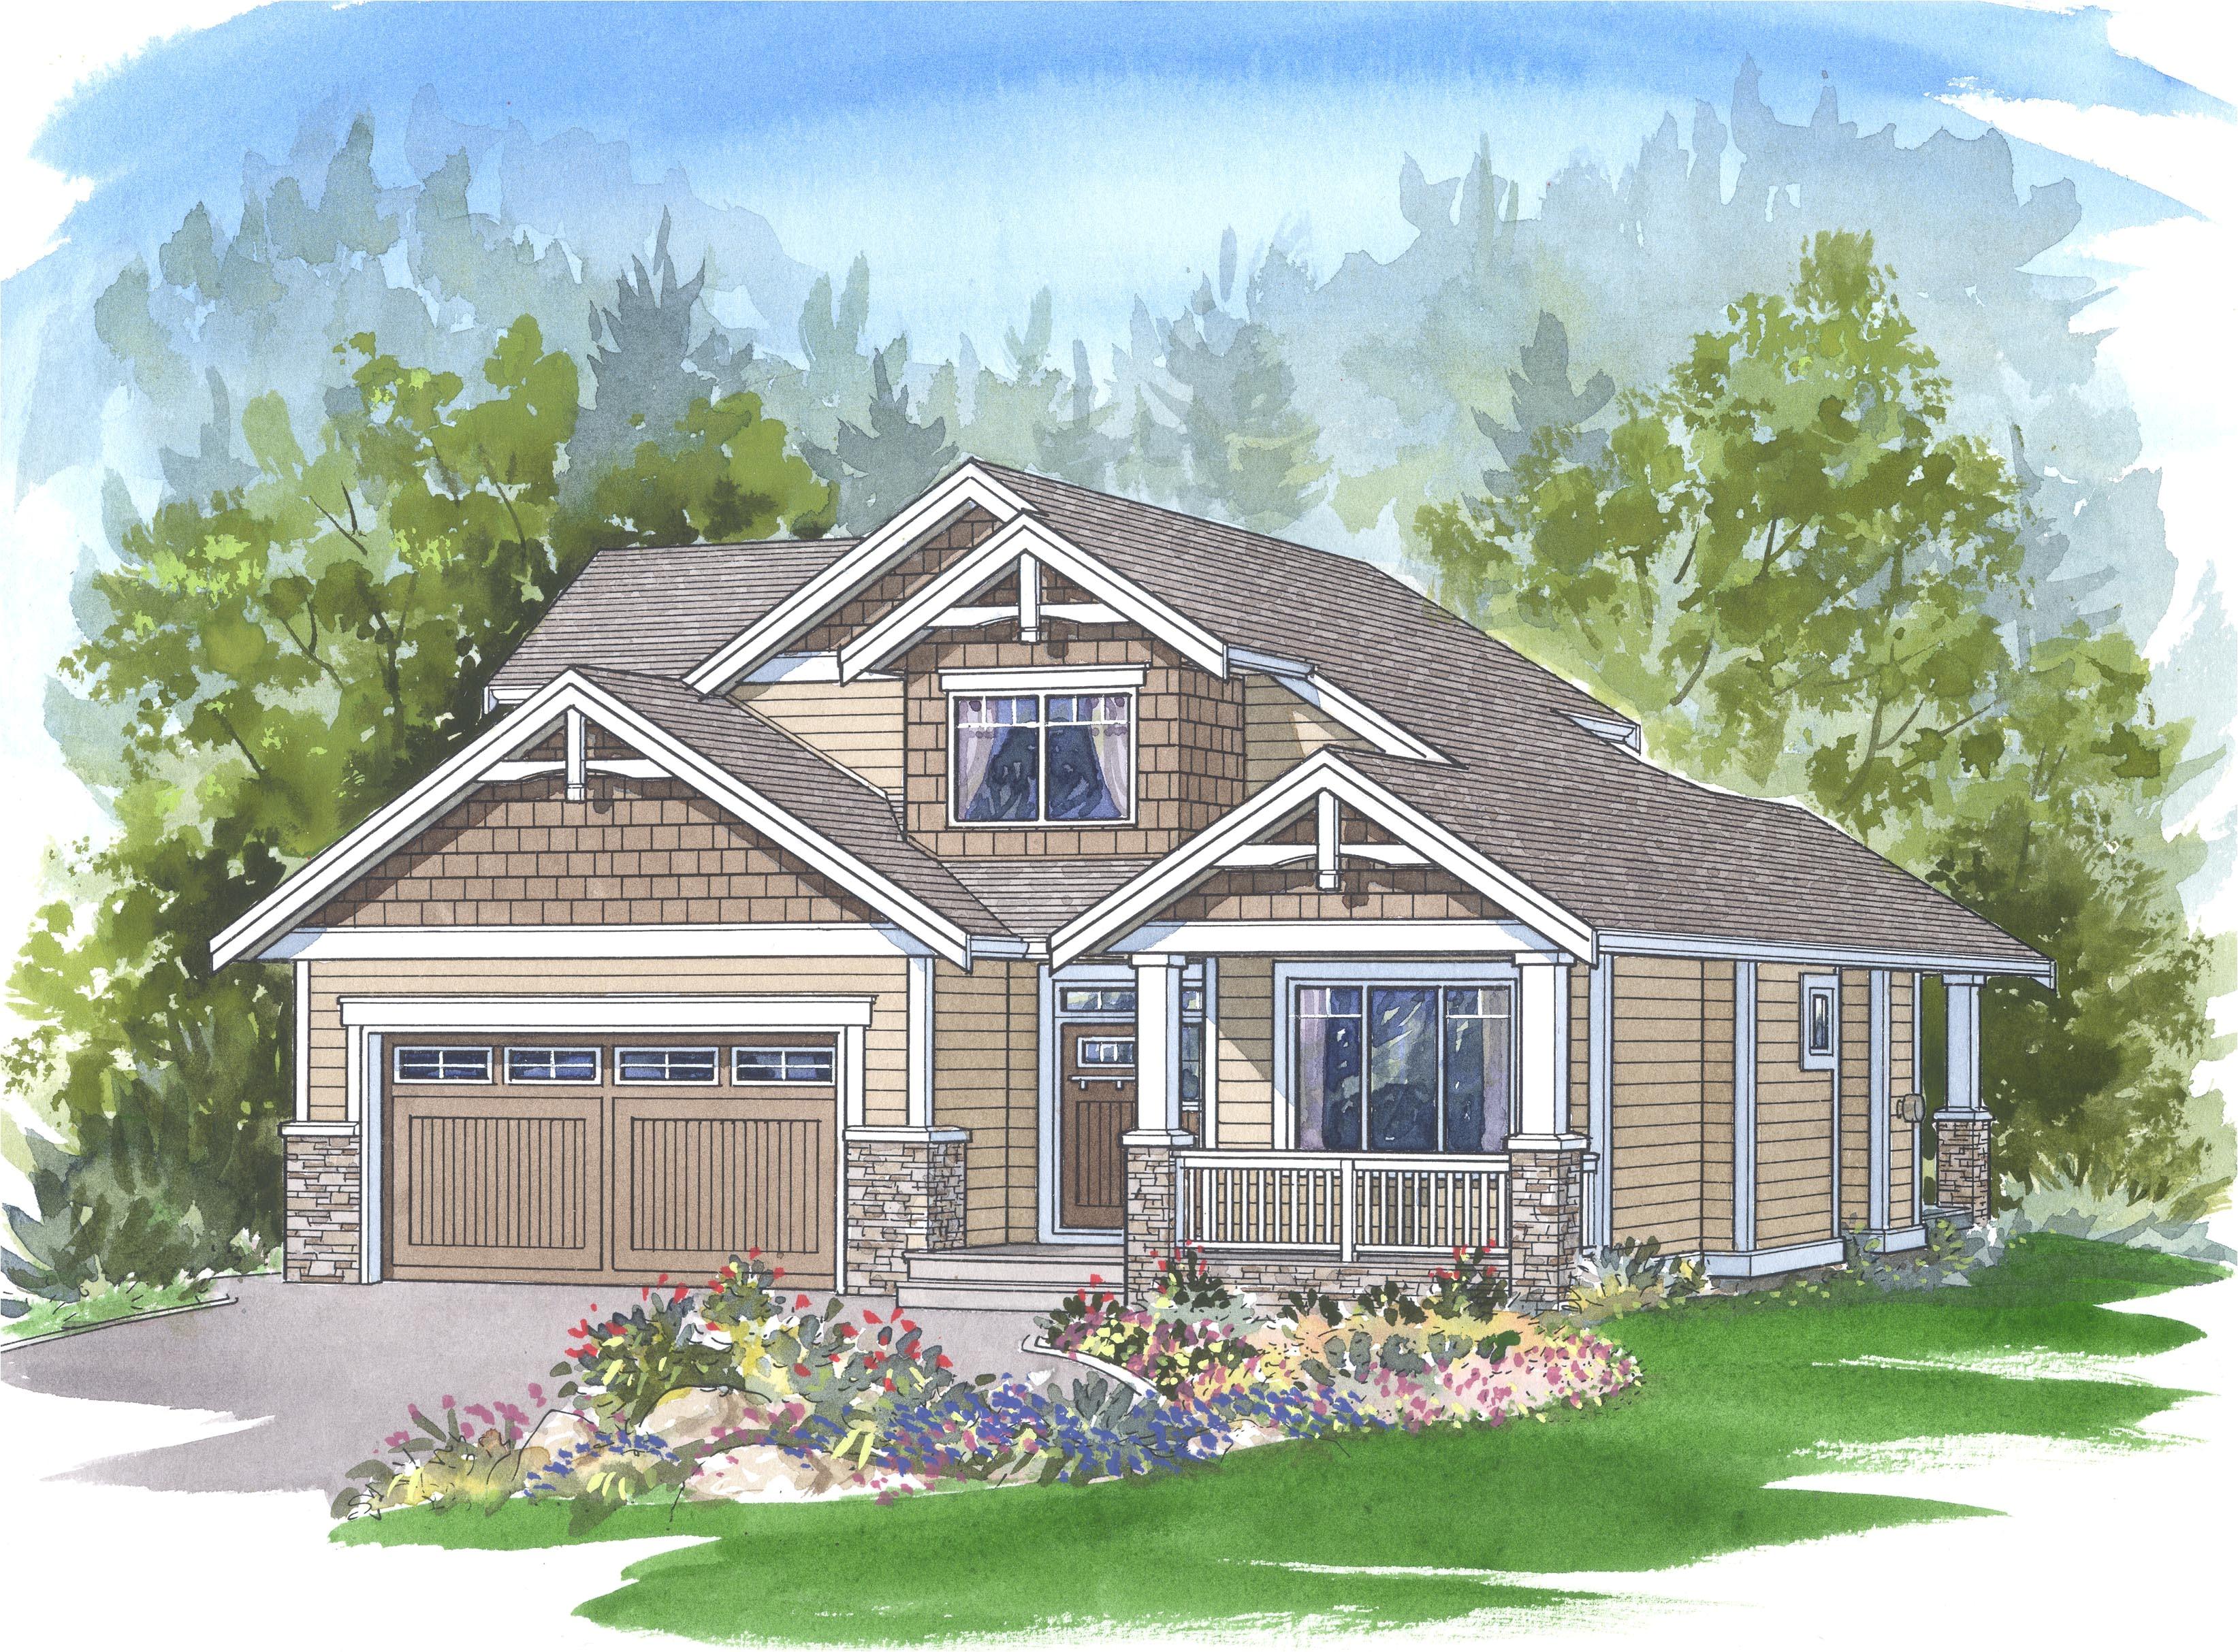 inspiring jenish home designs photo